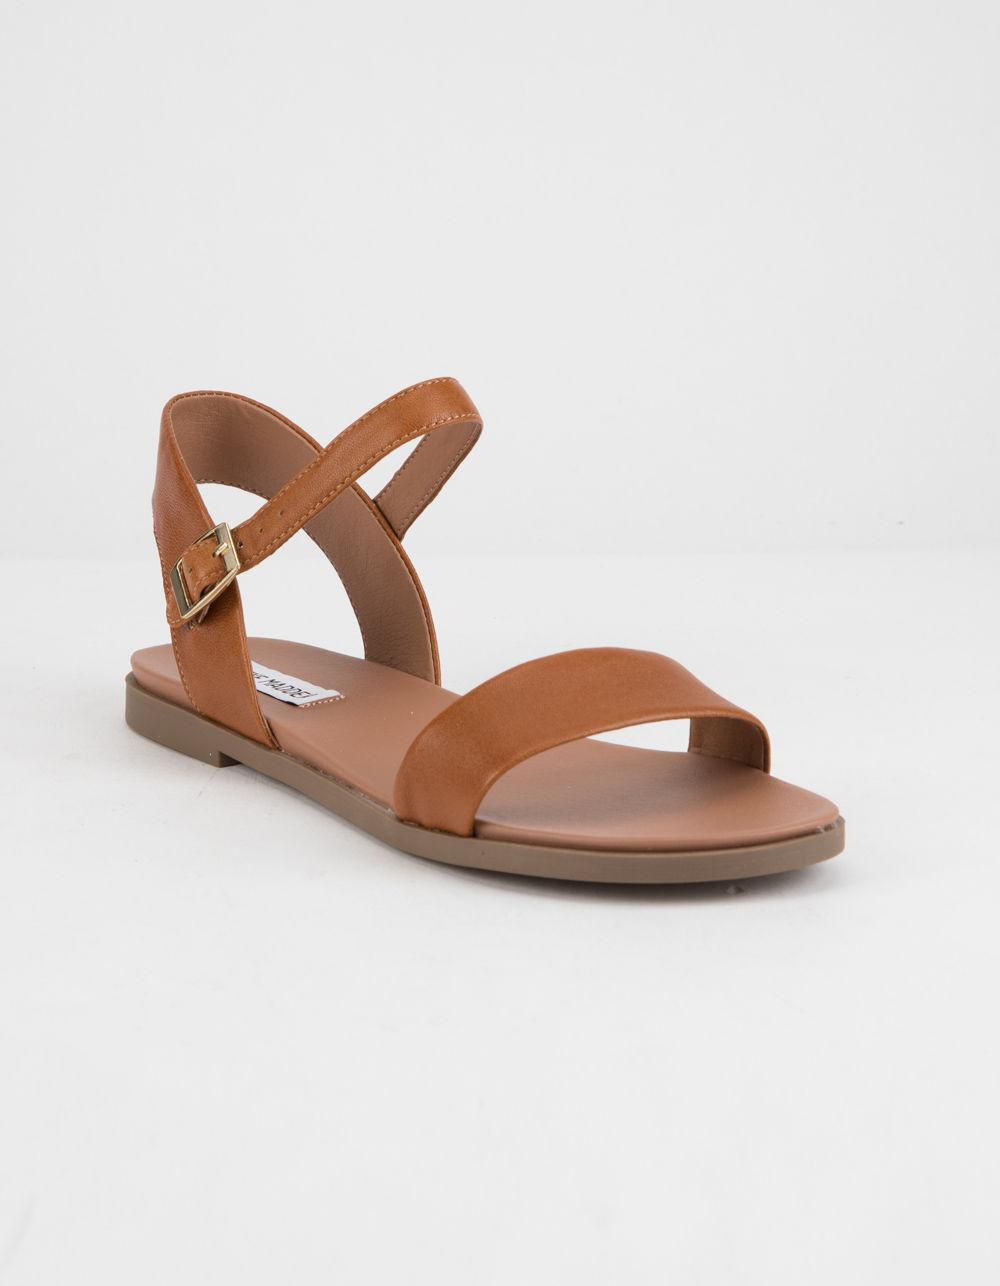 0ede6f26629 Lyst - Steve Madden Dina Tan Womens Sandals in Brown